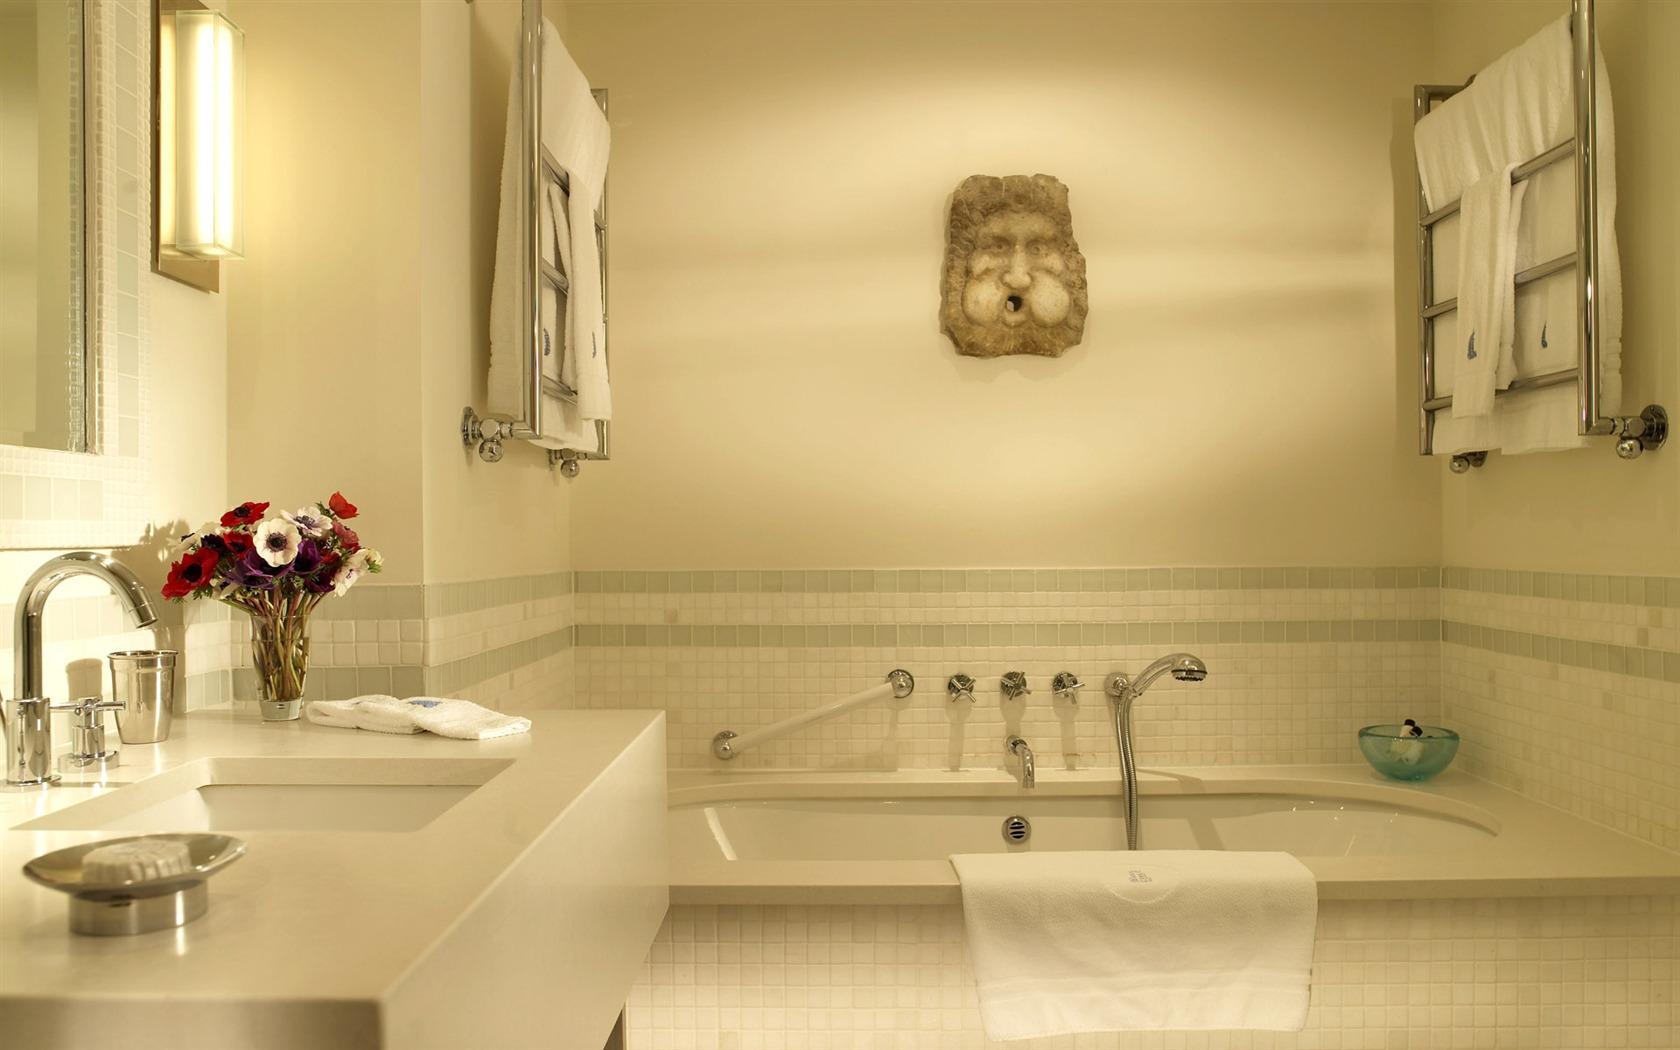 Fond d 39 cran photo salle de bain 1 2 1680x1050 fond d for Ecran salle de bain